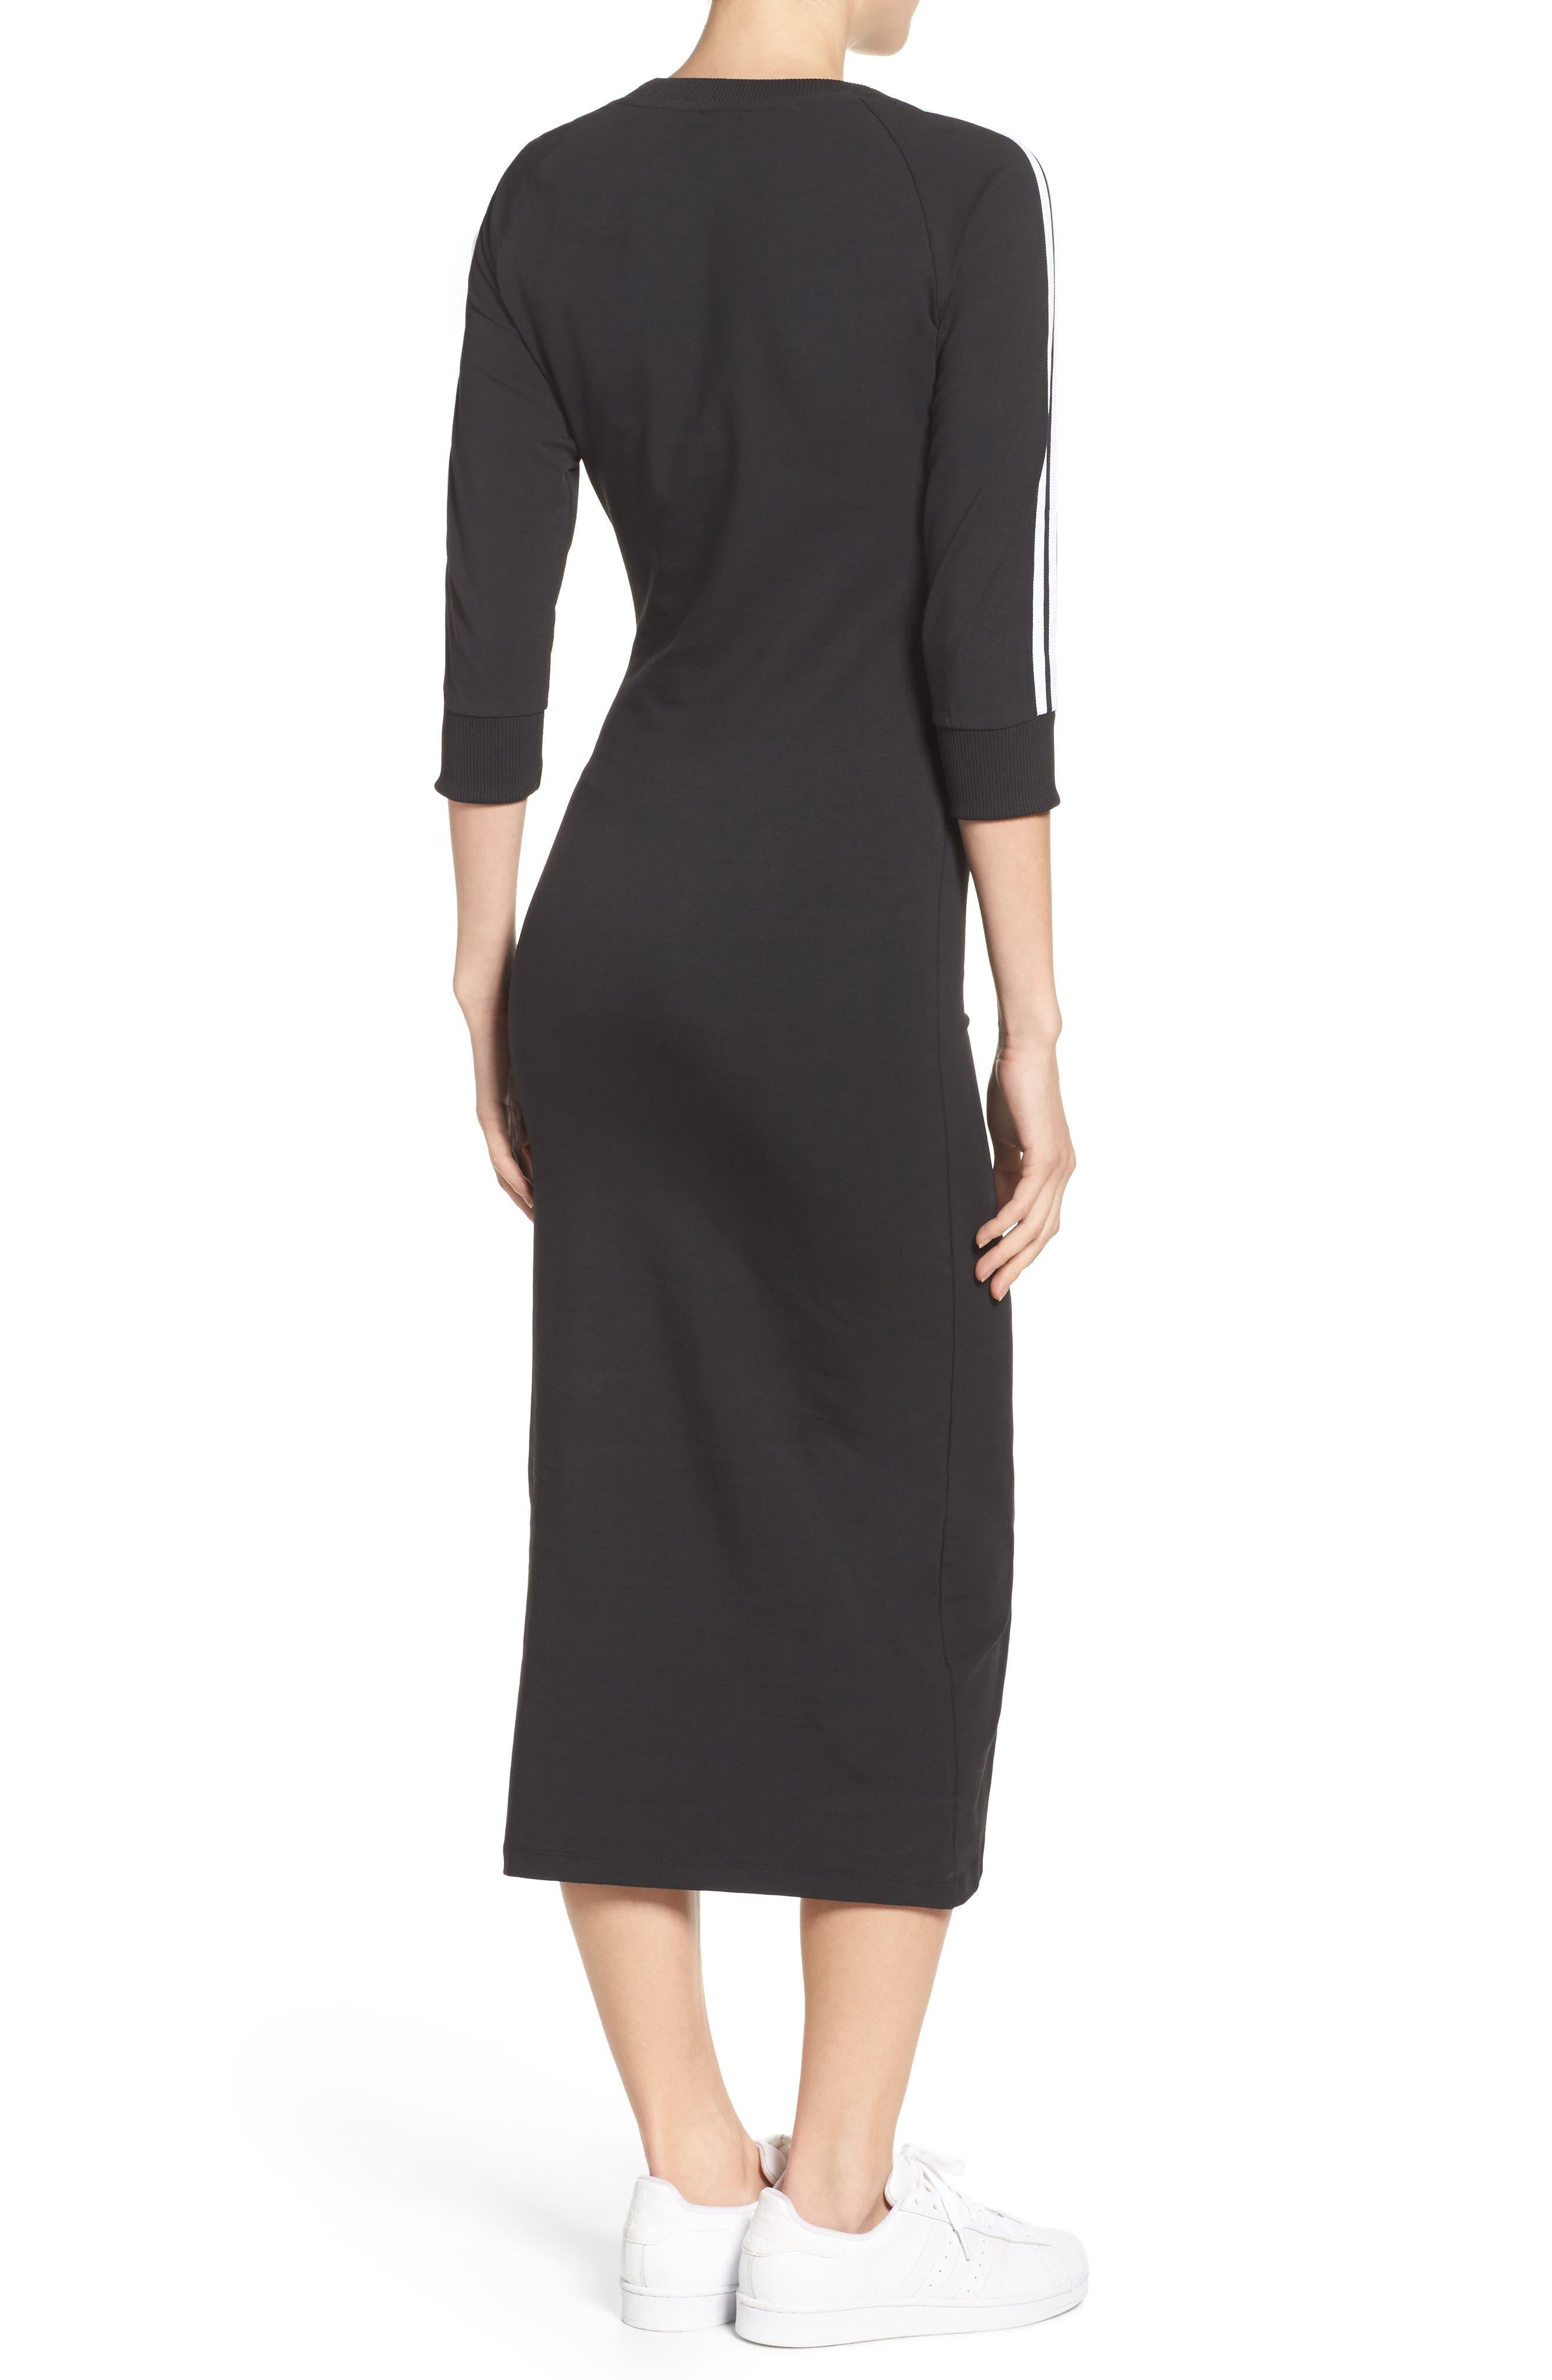 Originals 3-Stripes Dress,                             Alternate thumbnail 2, color,                             Black